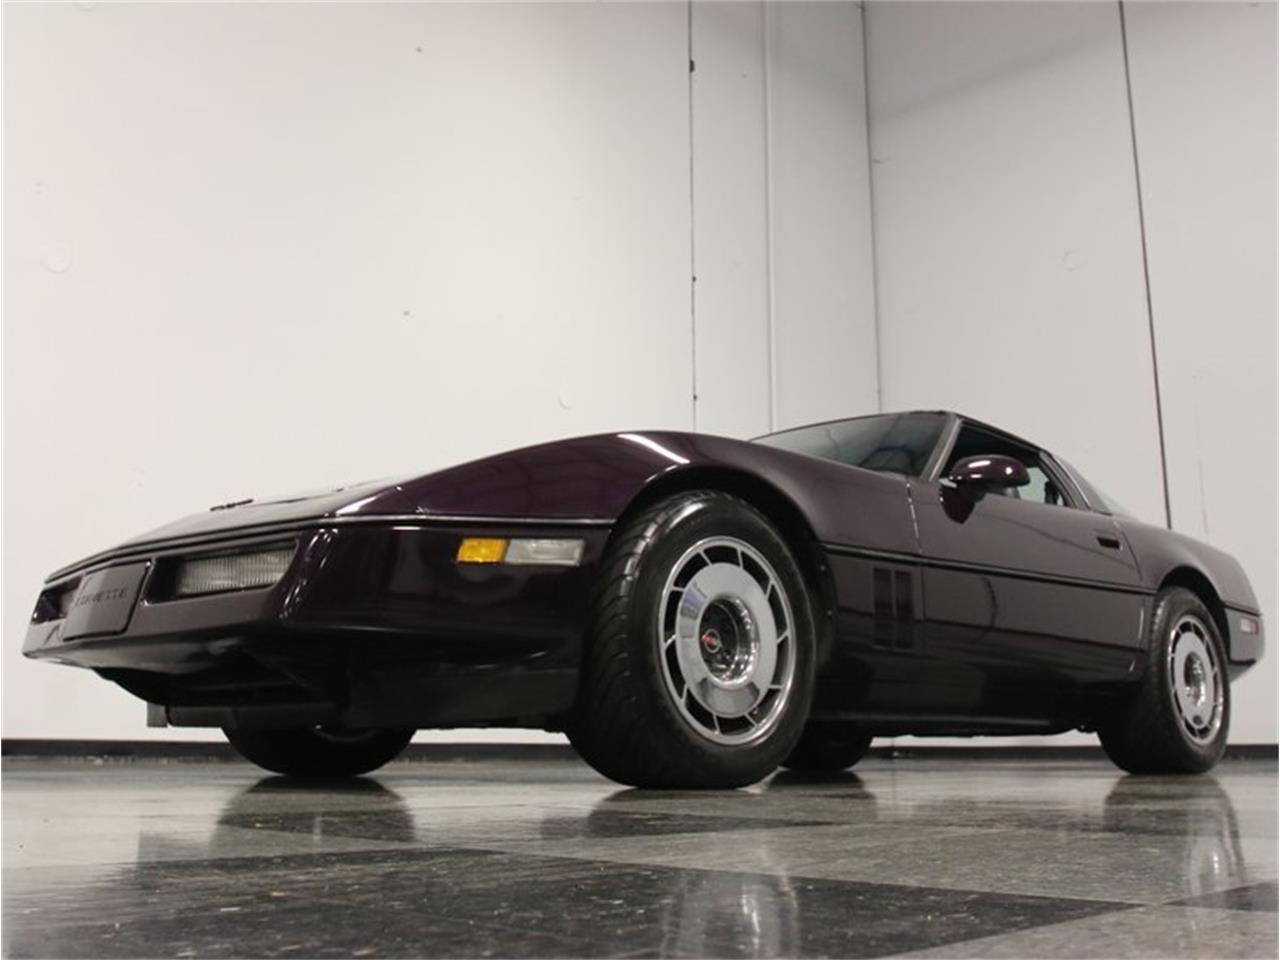 Large Picture of 1985 Corvette located in Lithia Springs Georgia - $14,995.00 - FPQQ